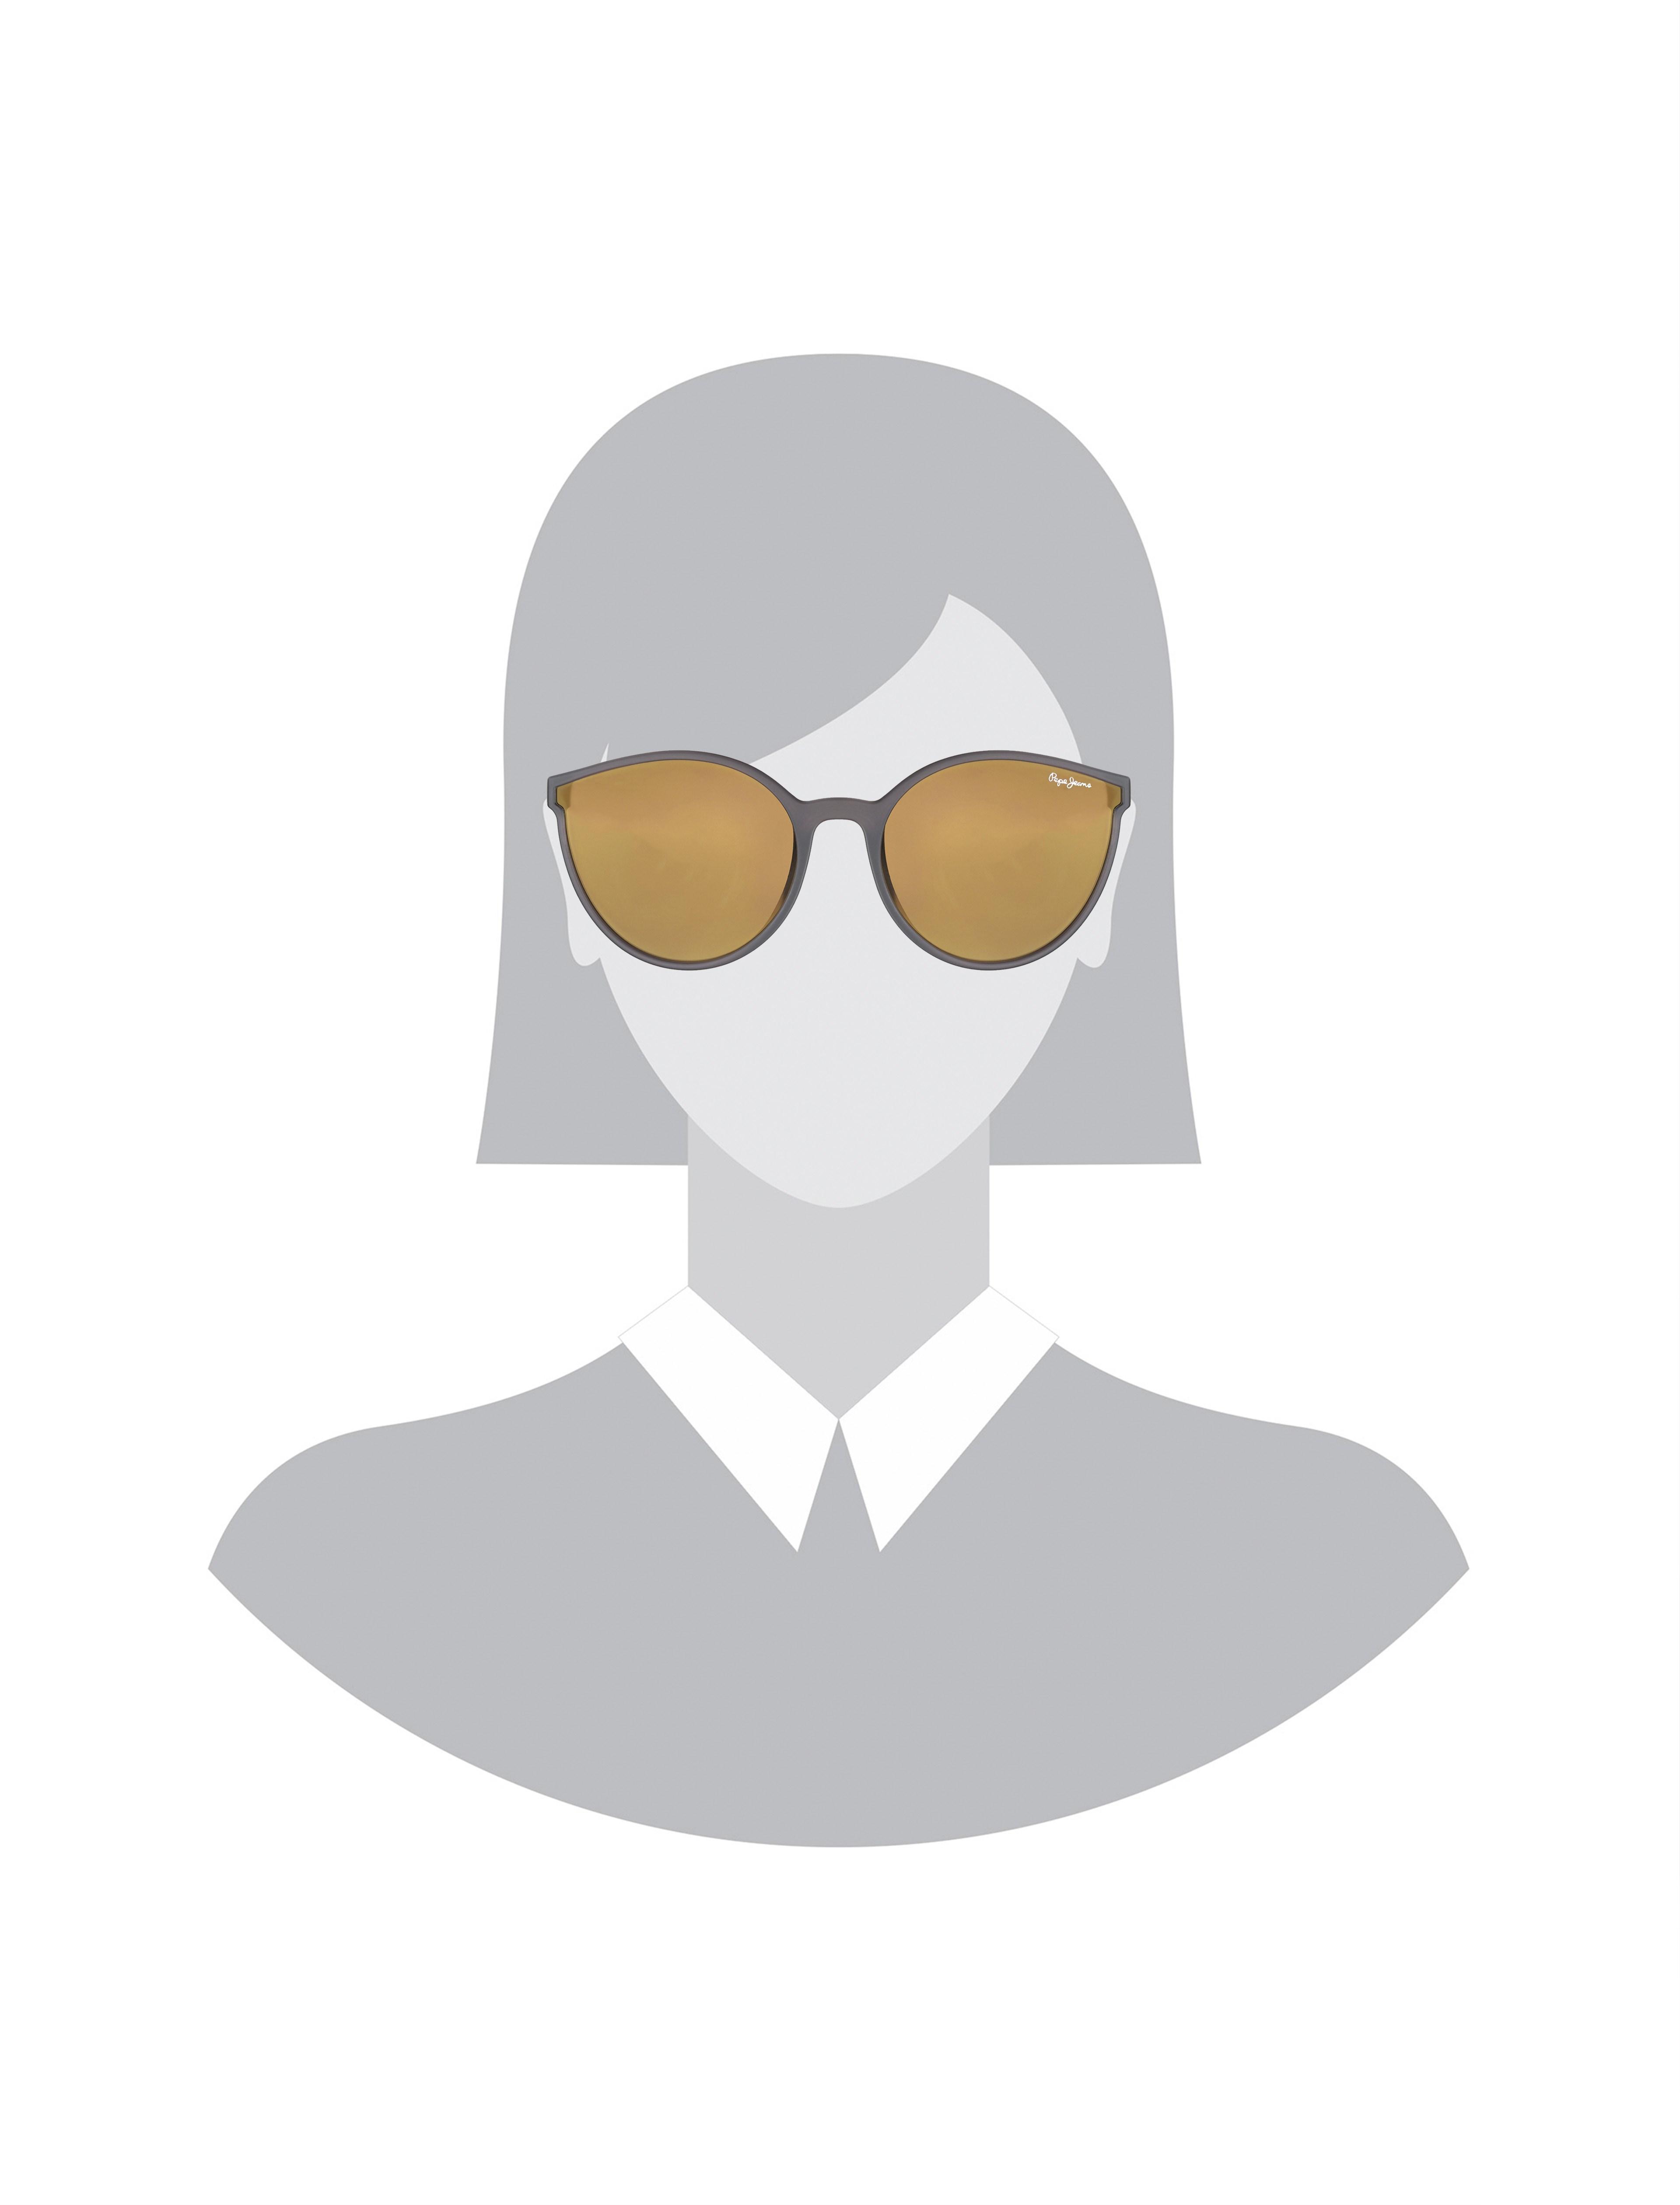 عینک آفتابی پروانه ای زنانه - پپه جینز - زغالي - 5